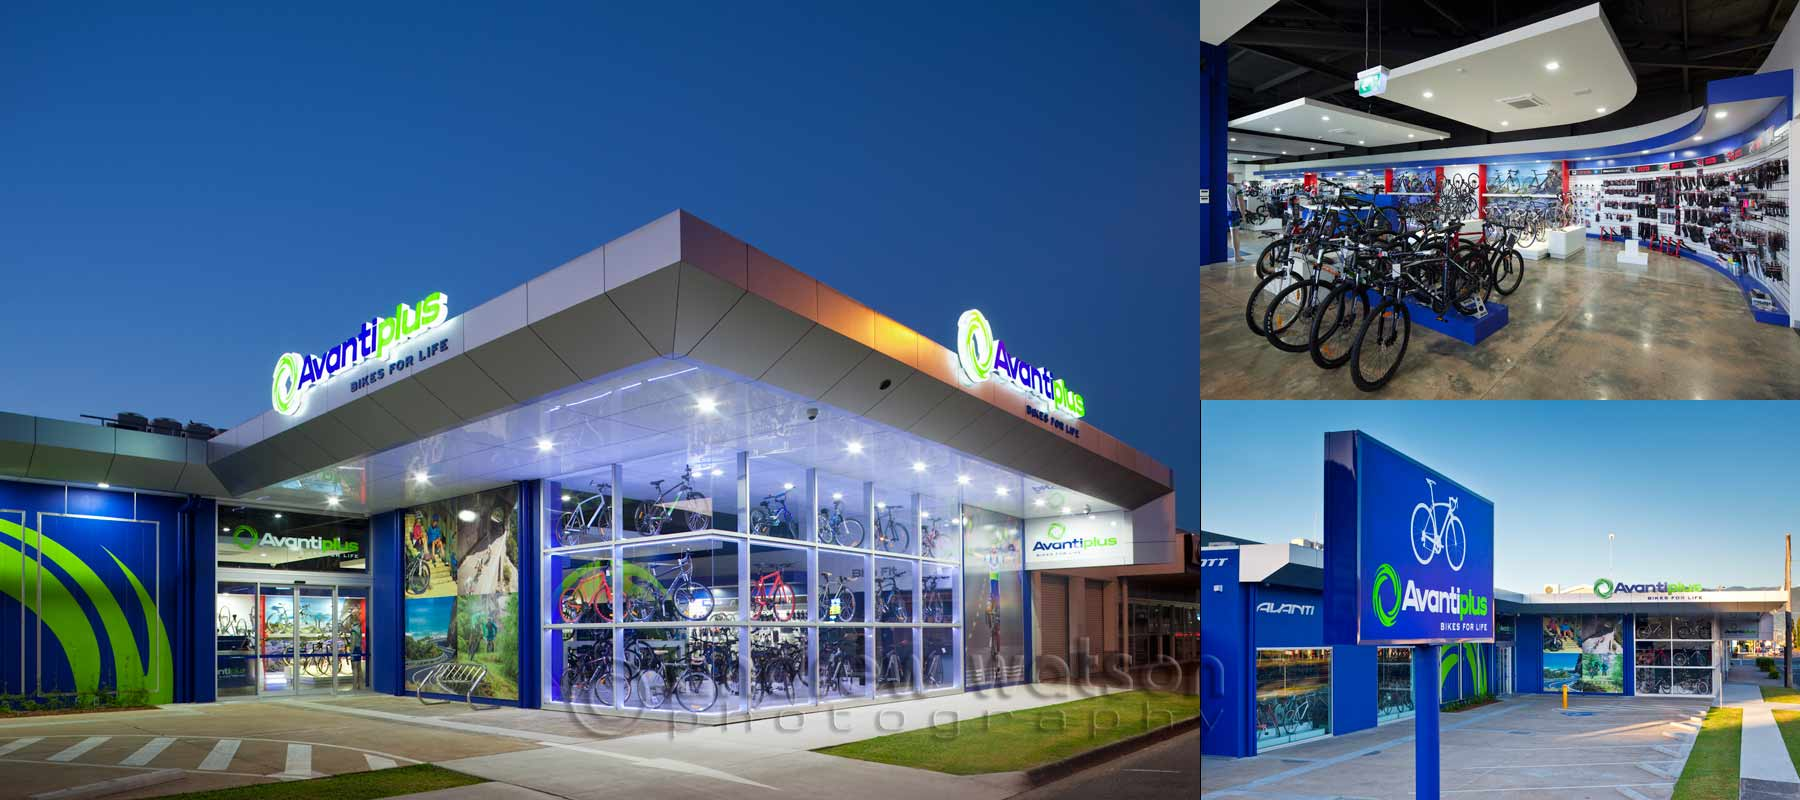 Commercial photography - AvantiPlus Bike Store, Cairns